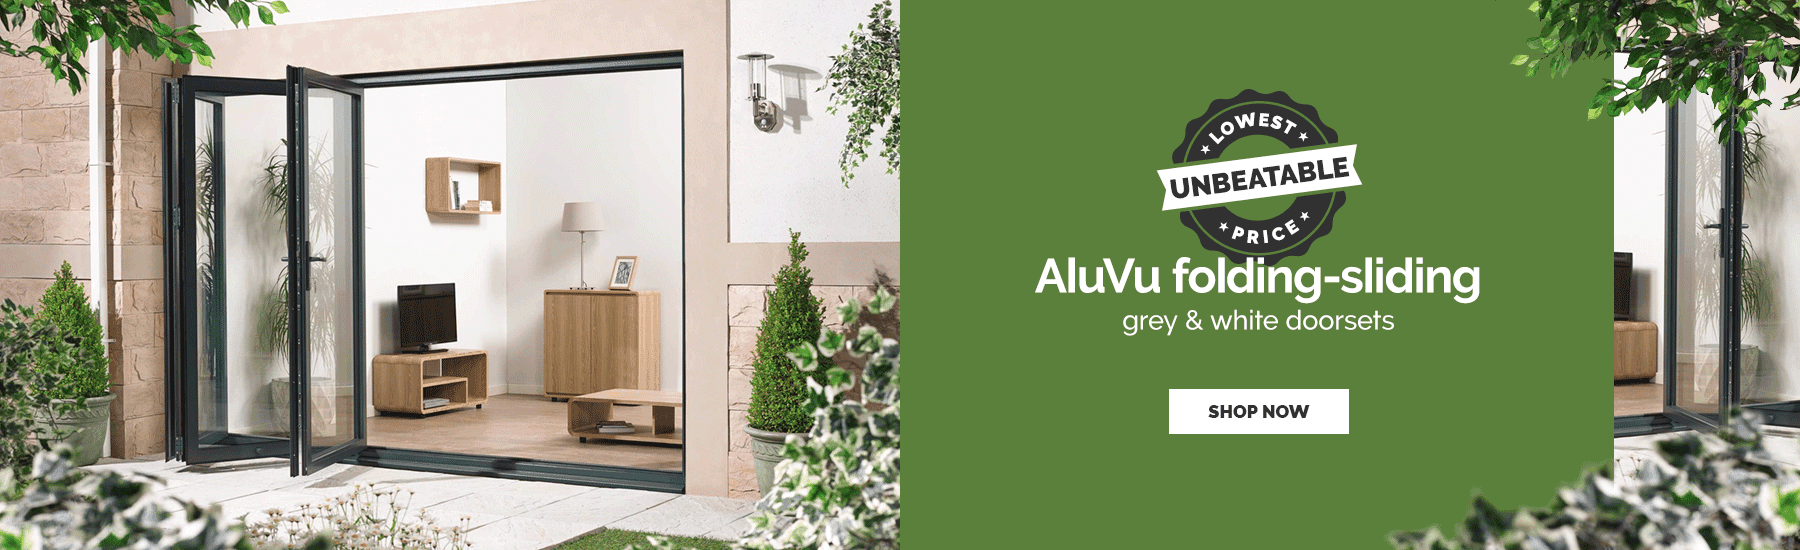 June - AluVu sliding-folding doorsets